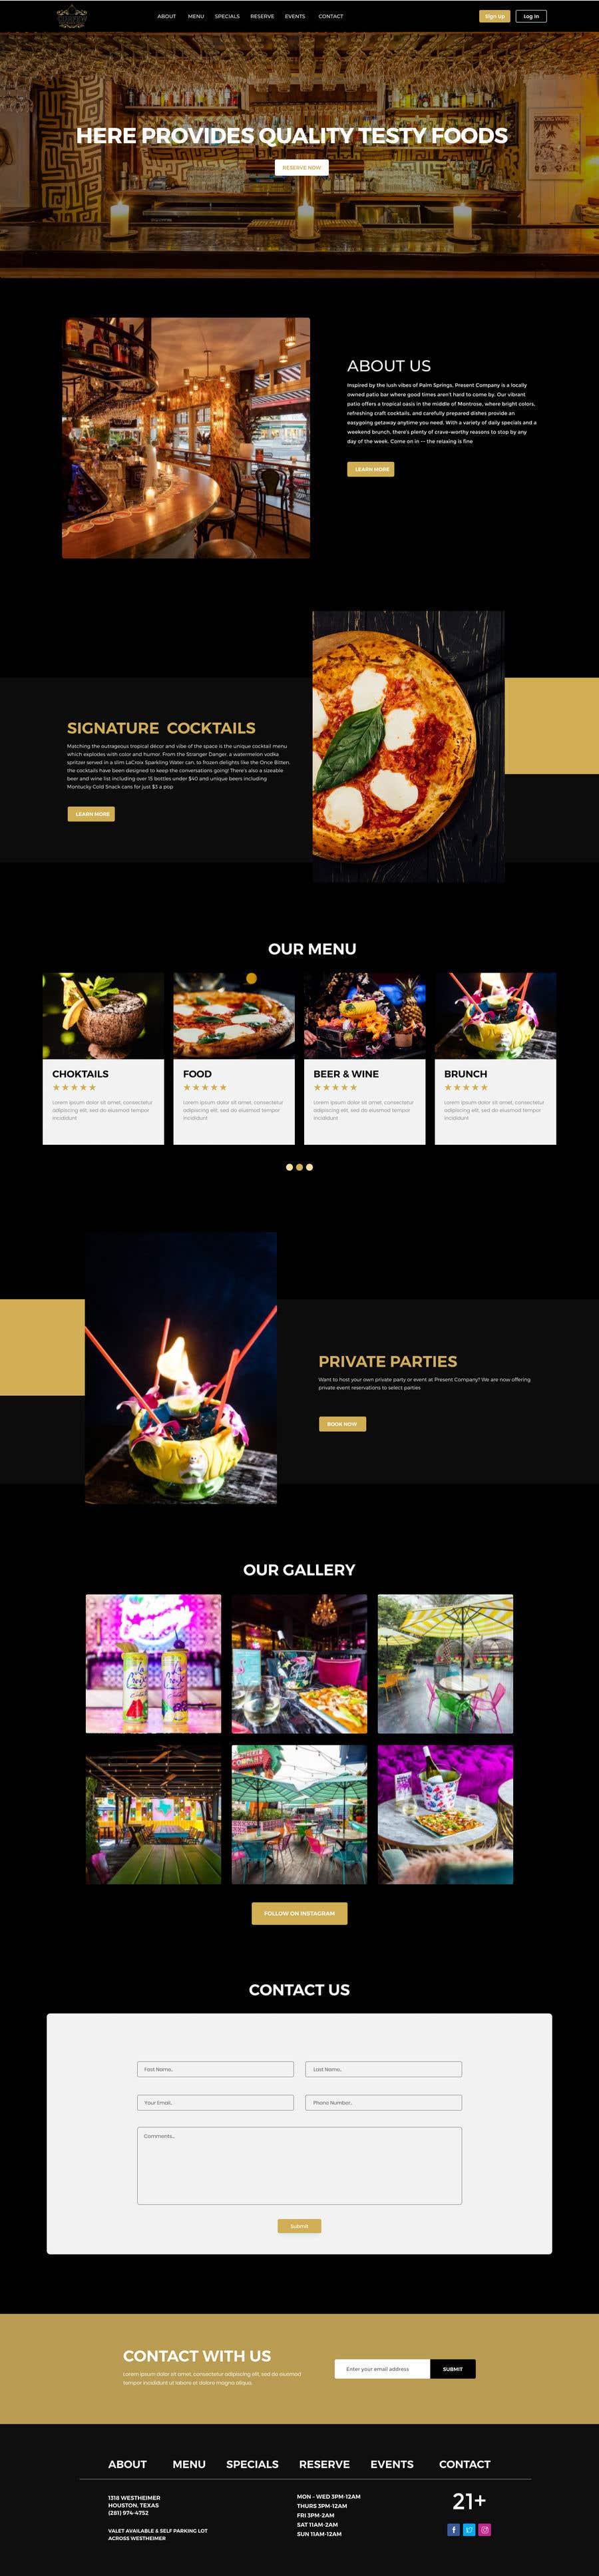 Contest Entry #                                        159                                      for                                         Design FUN Website for Speakeasy Concept